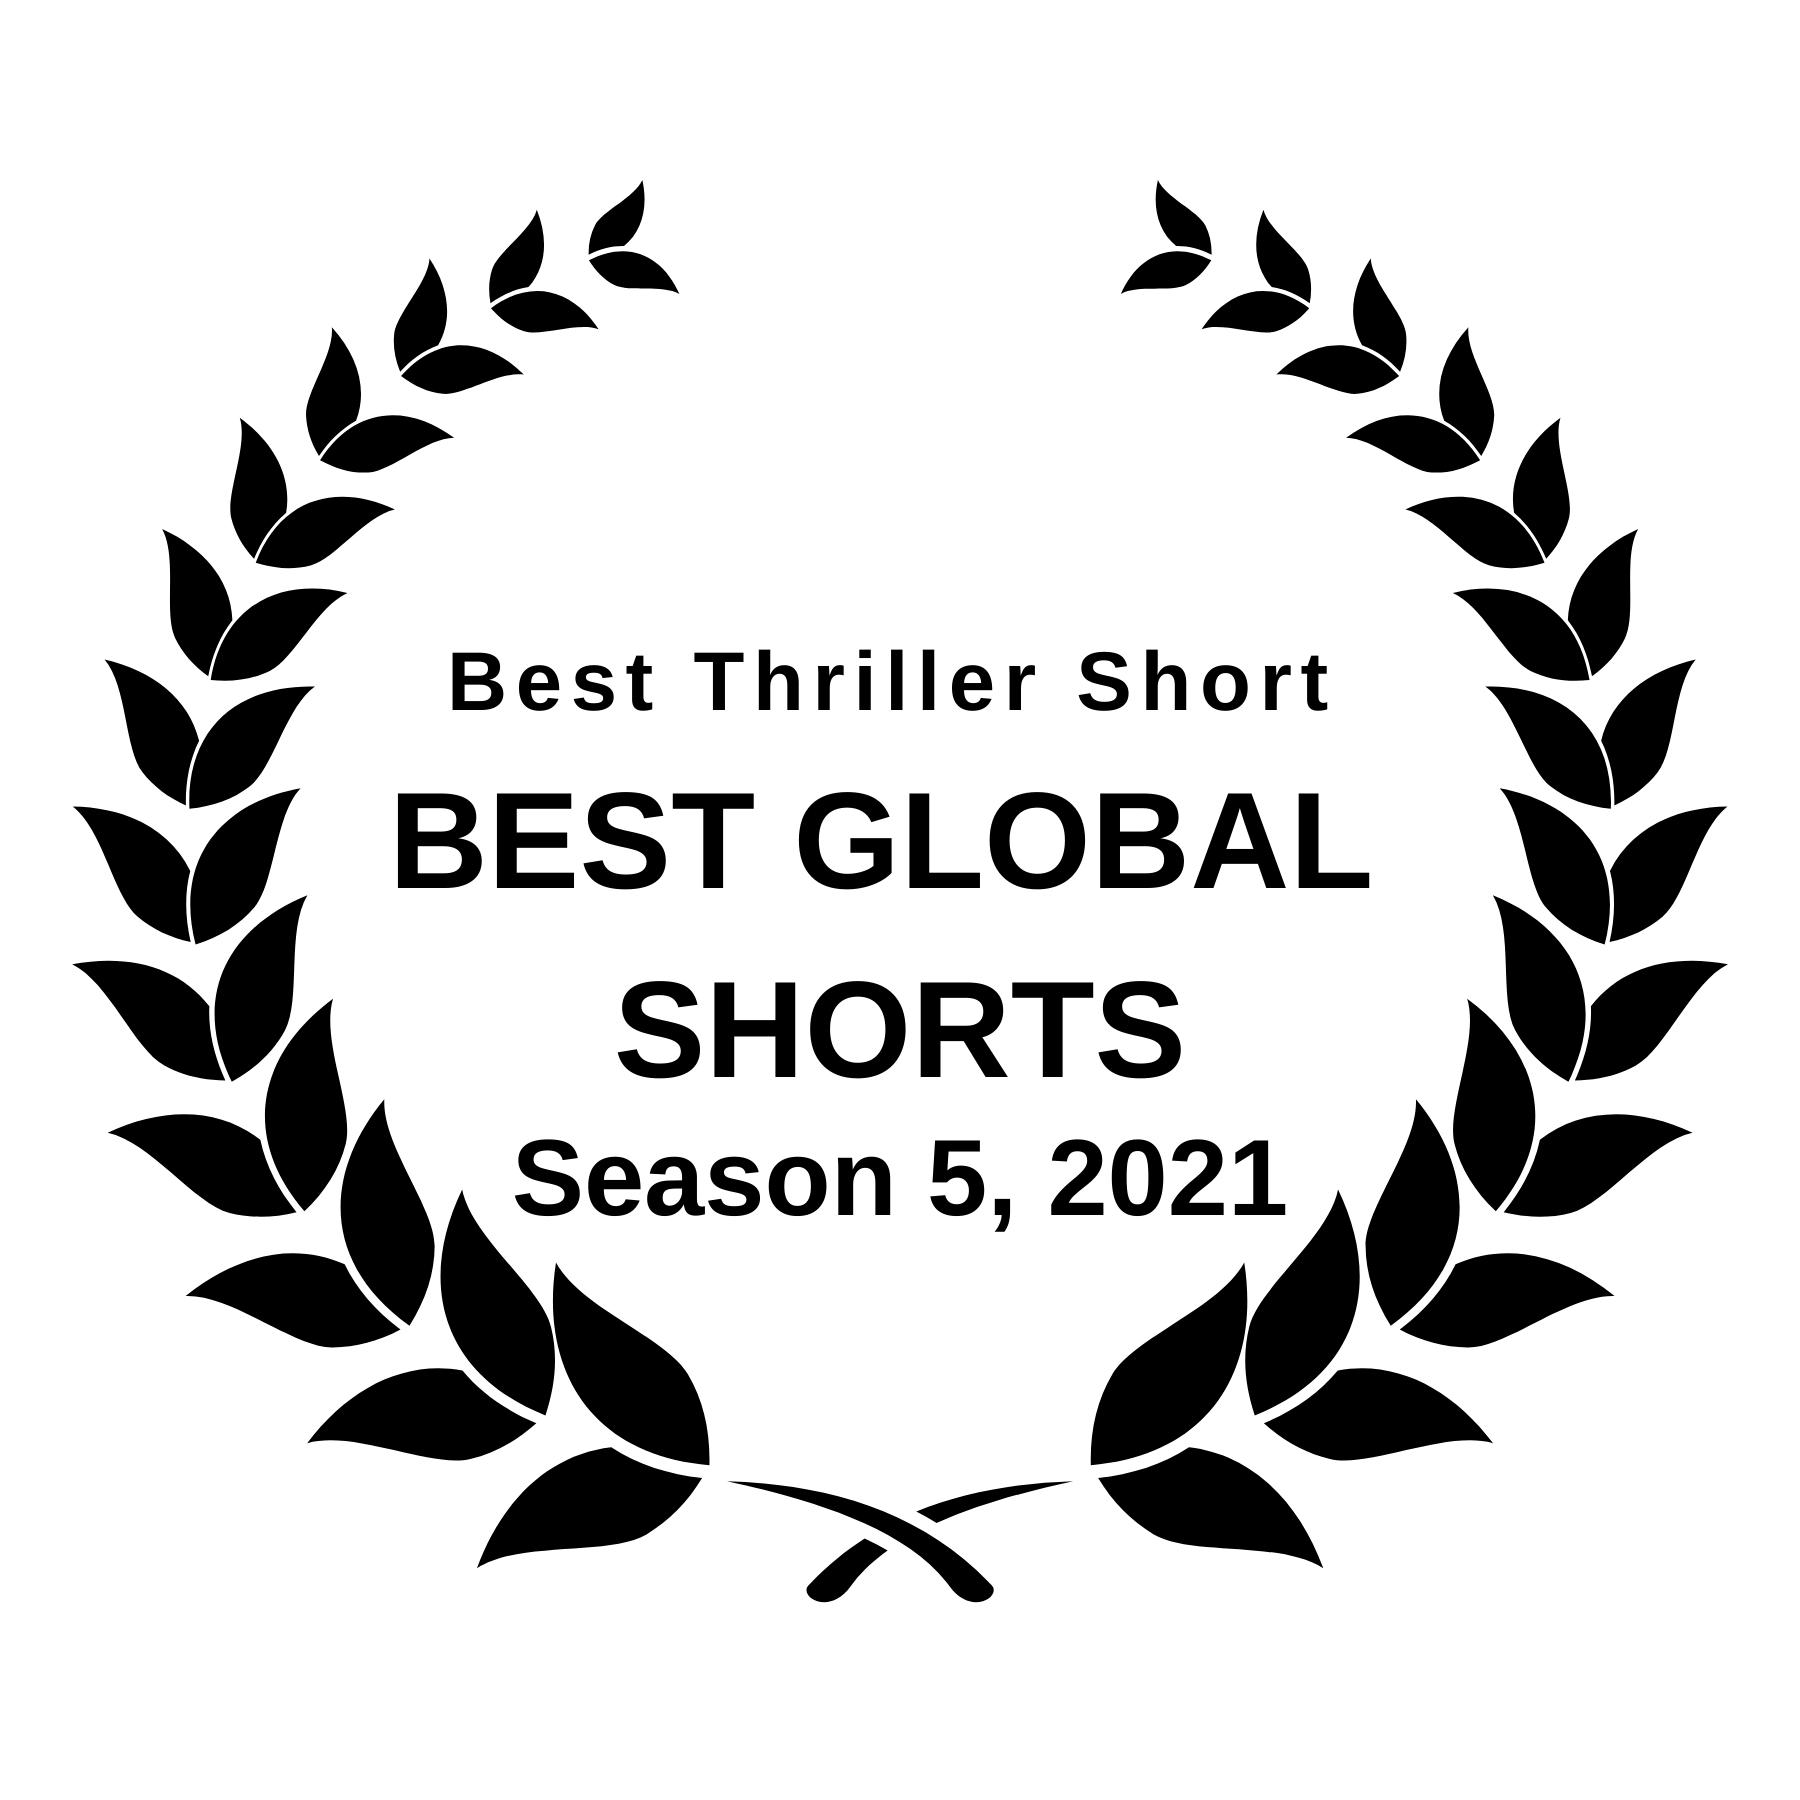 Best Global Shorts - Best Thriler Short